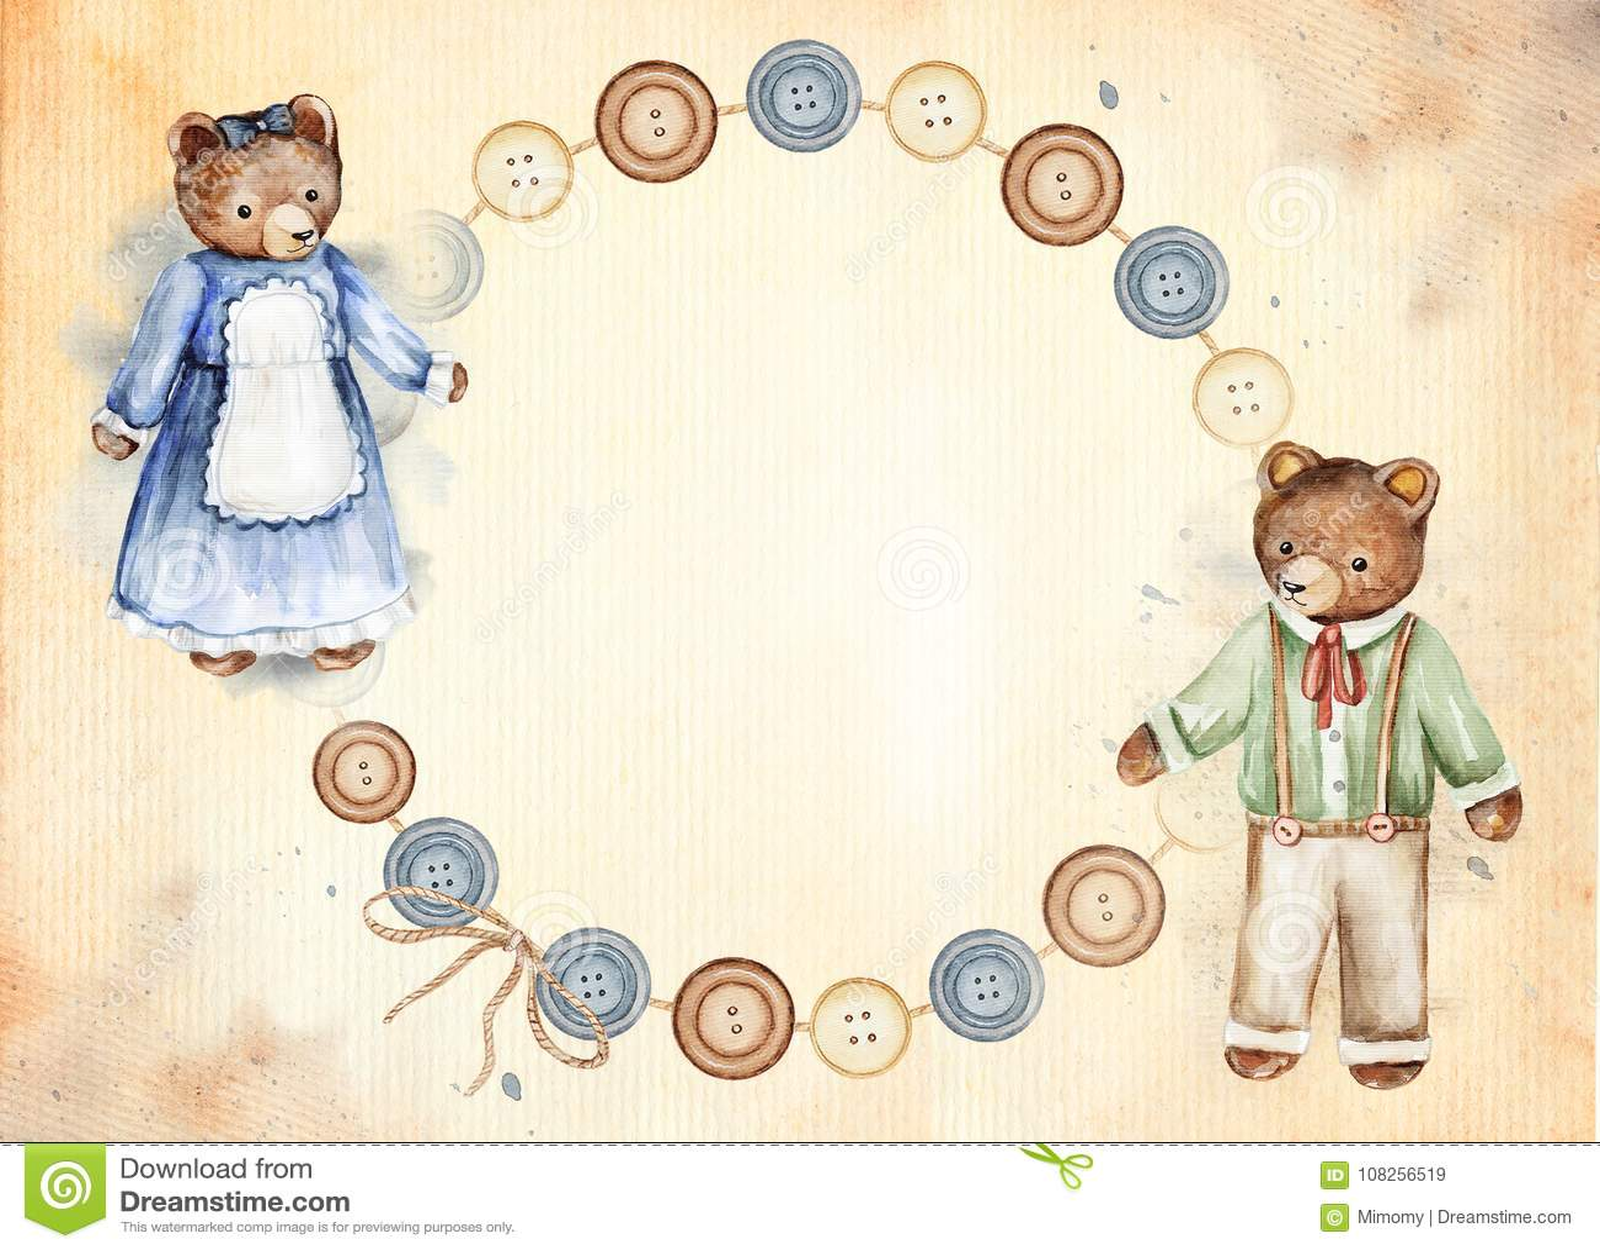 7a83ba46aa Εκλεκτής ποιότητας στρογγυλό πλαίσιο με τις χαριτωμένα αρκούδες και τα  κουμπιά Συρμένη χέρι απεικόνιση Watercolor